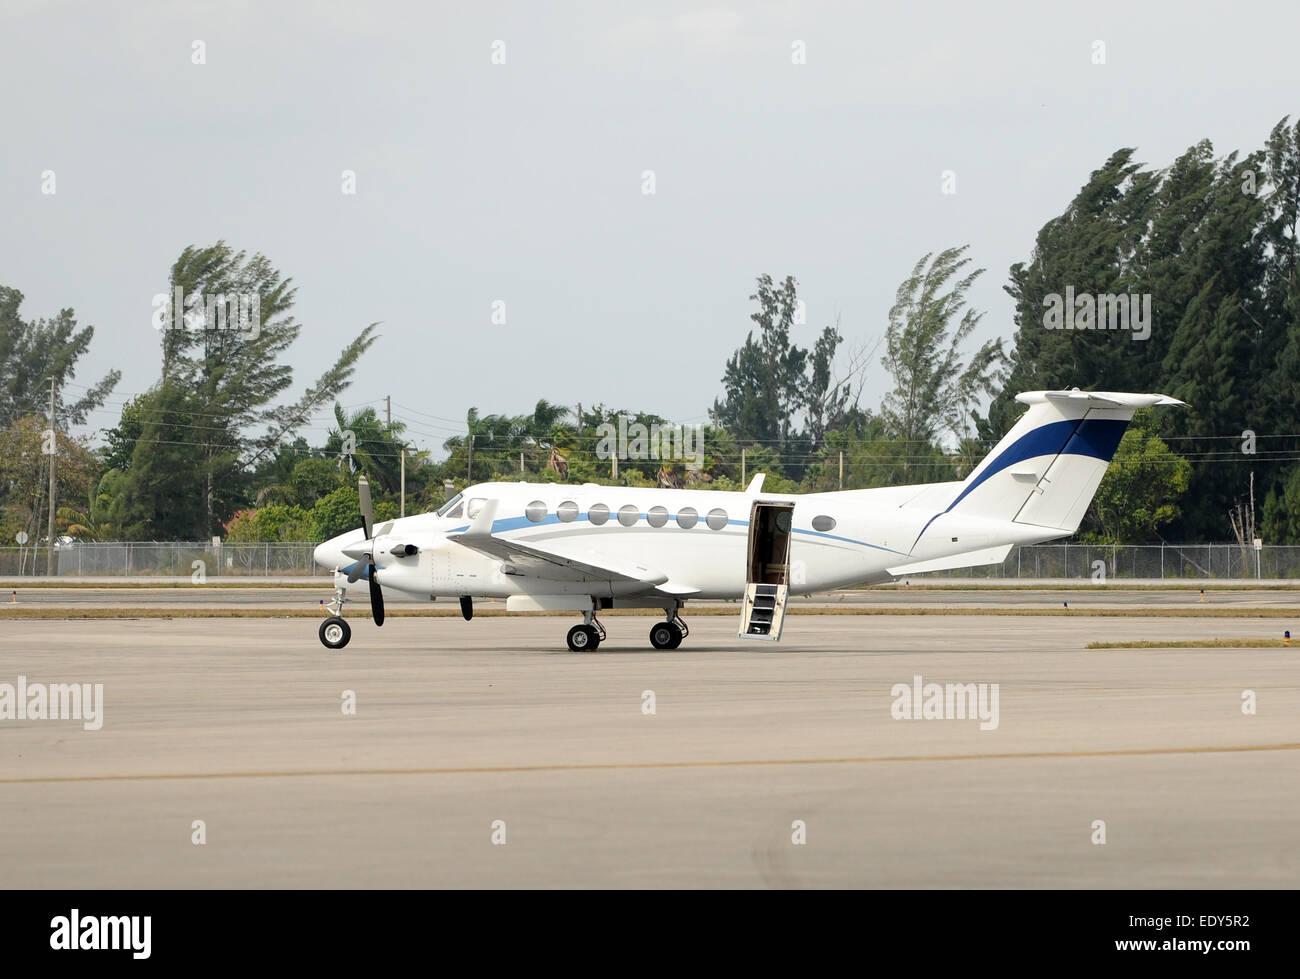 Turboprop airplane for regional travel awaiting passengers - Stock Image